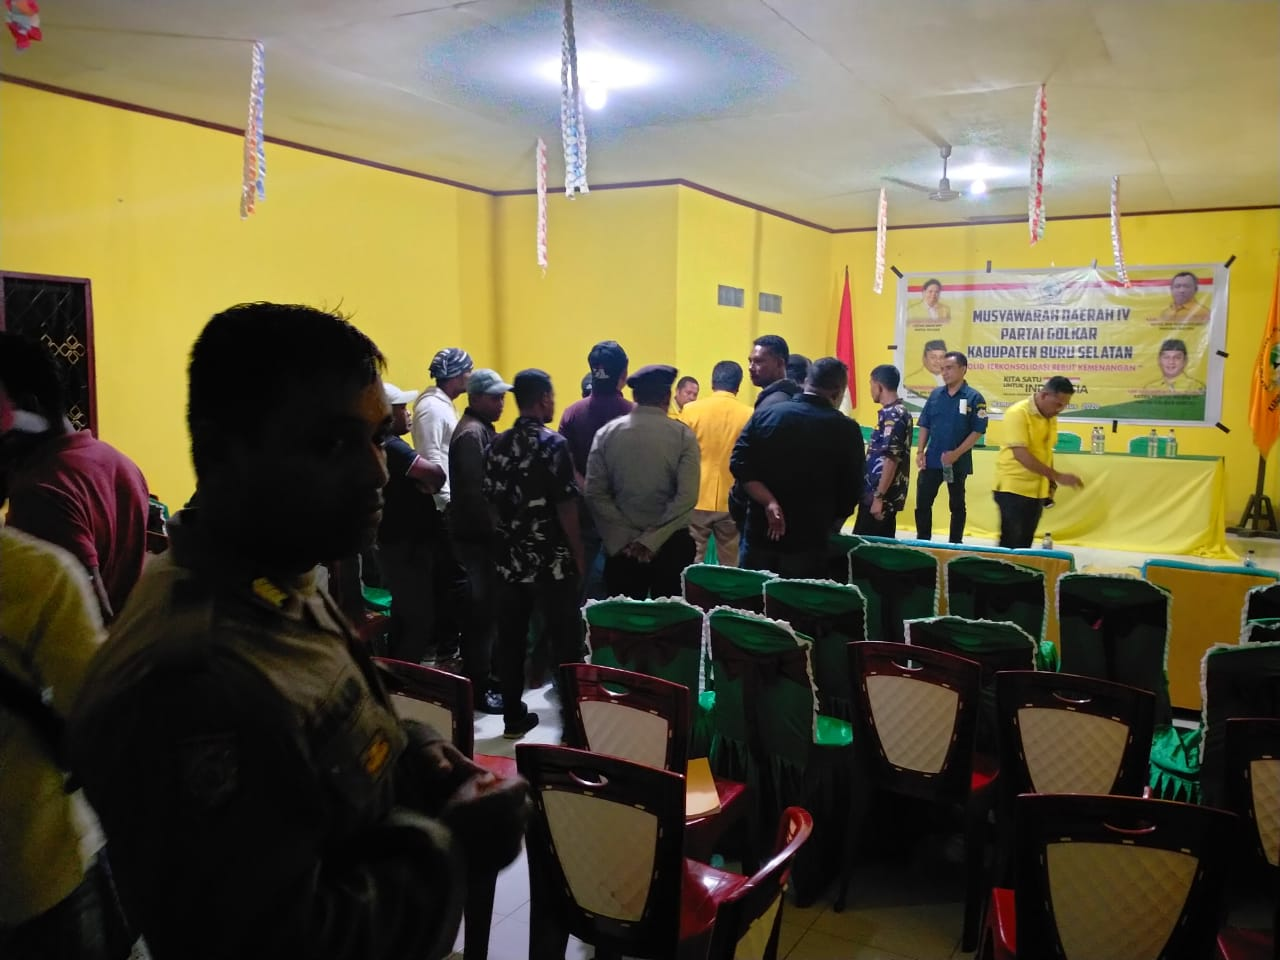 Nyaris Rusuh, Musda Golkar Buru Selatan Dipindahkan ke Kota Ambon